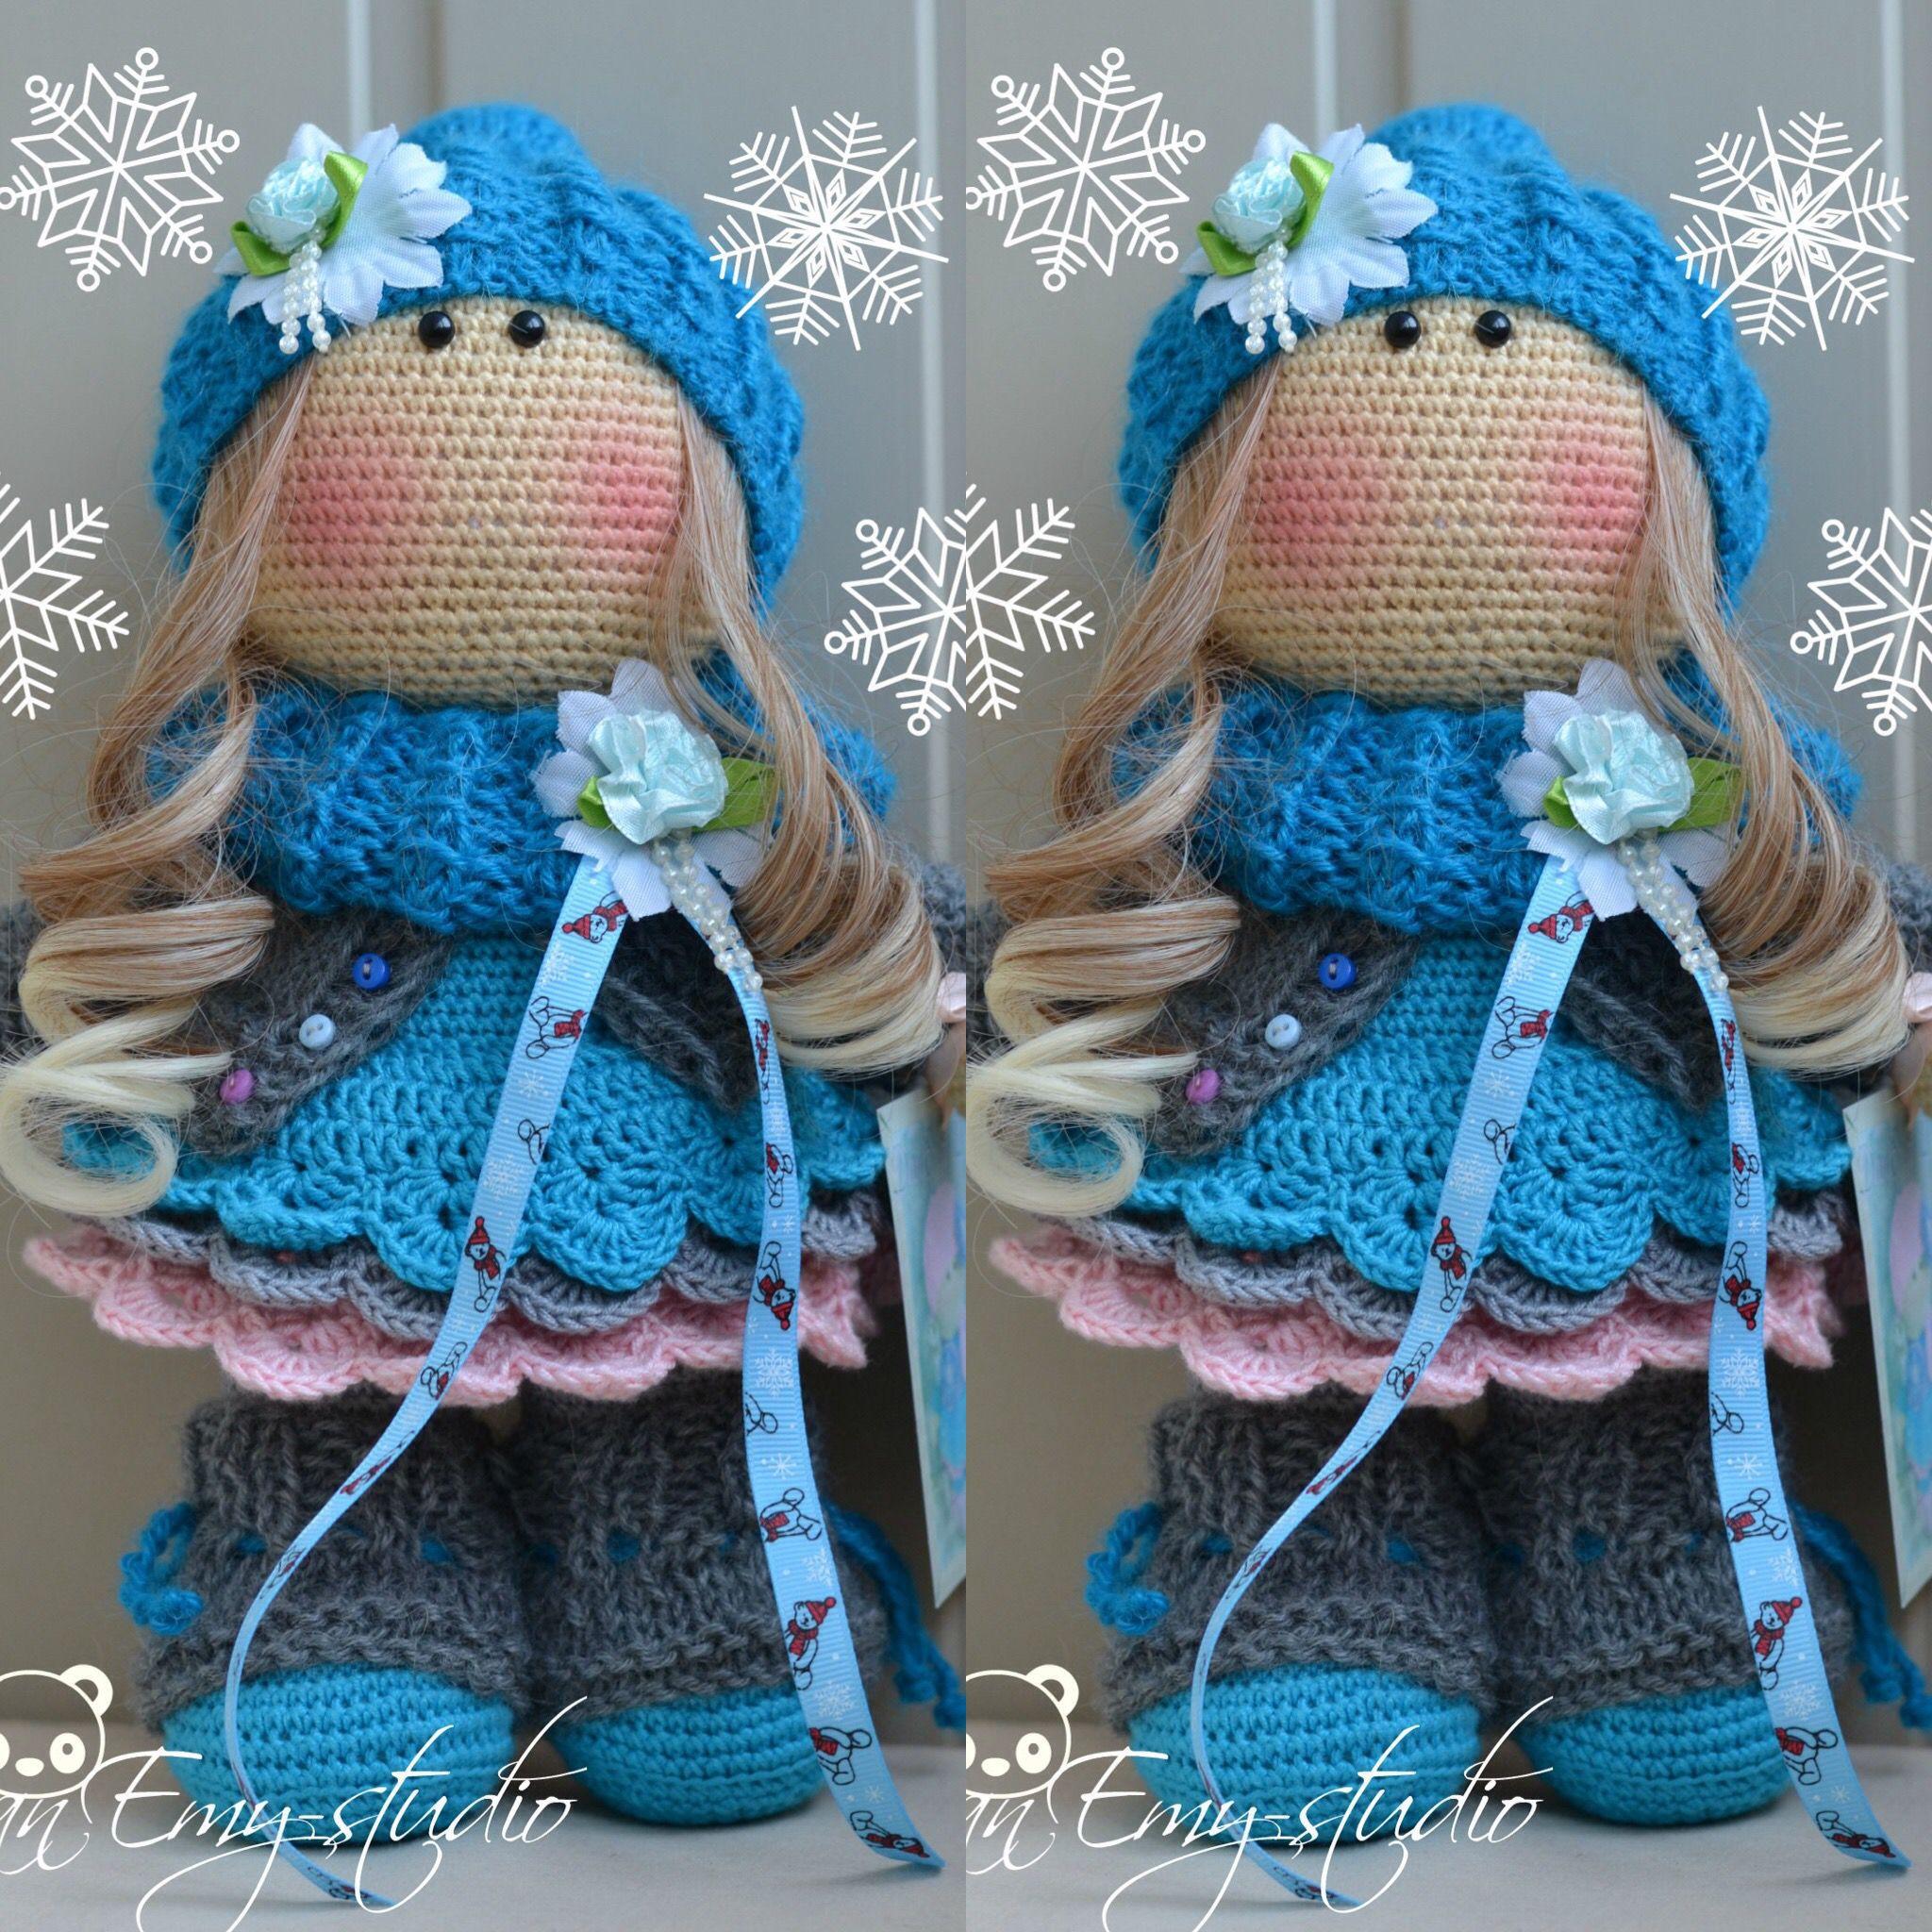 dolls кукла куклавподарок danemy_dolls кукларучнойработы авторскаякукла кукладлядуши интерьернаякукла